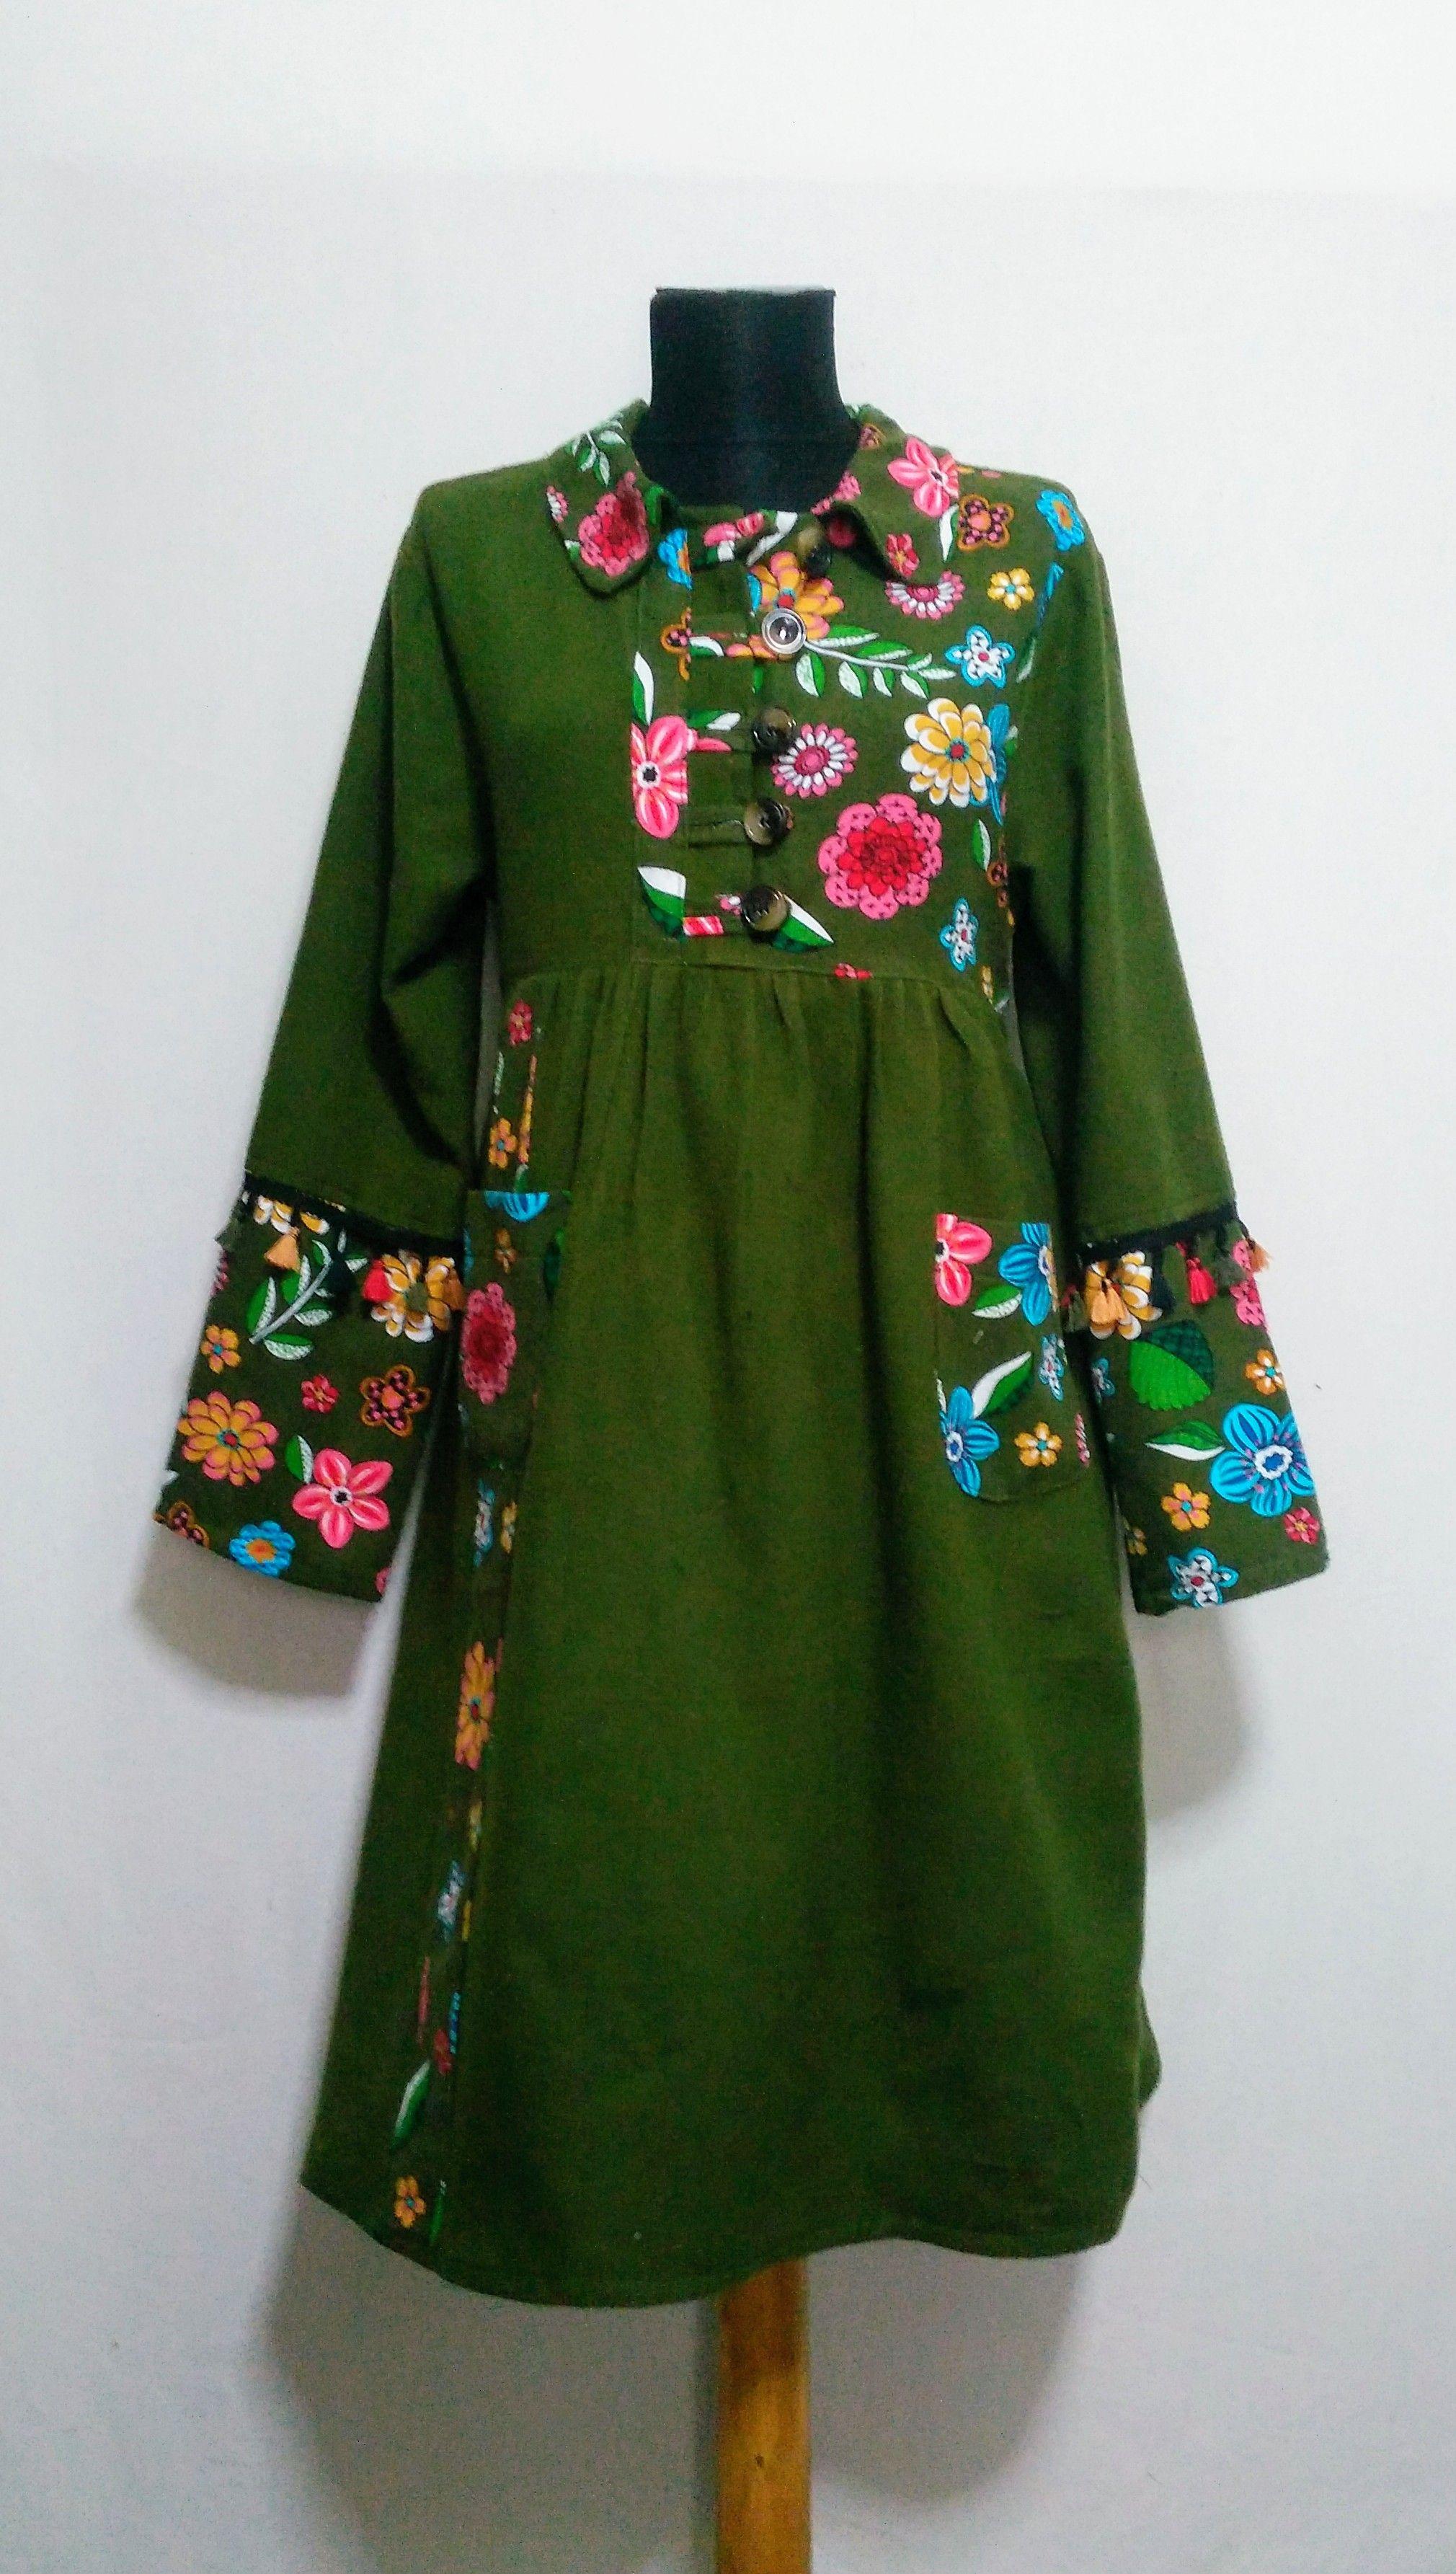 Haki Yesil Otantik Pazen Elbise Short Sleeve Denim Dress Upcycle Clothes Clothes